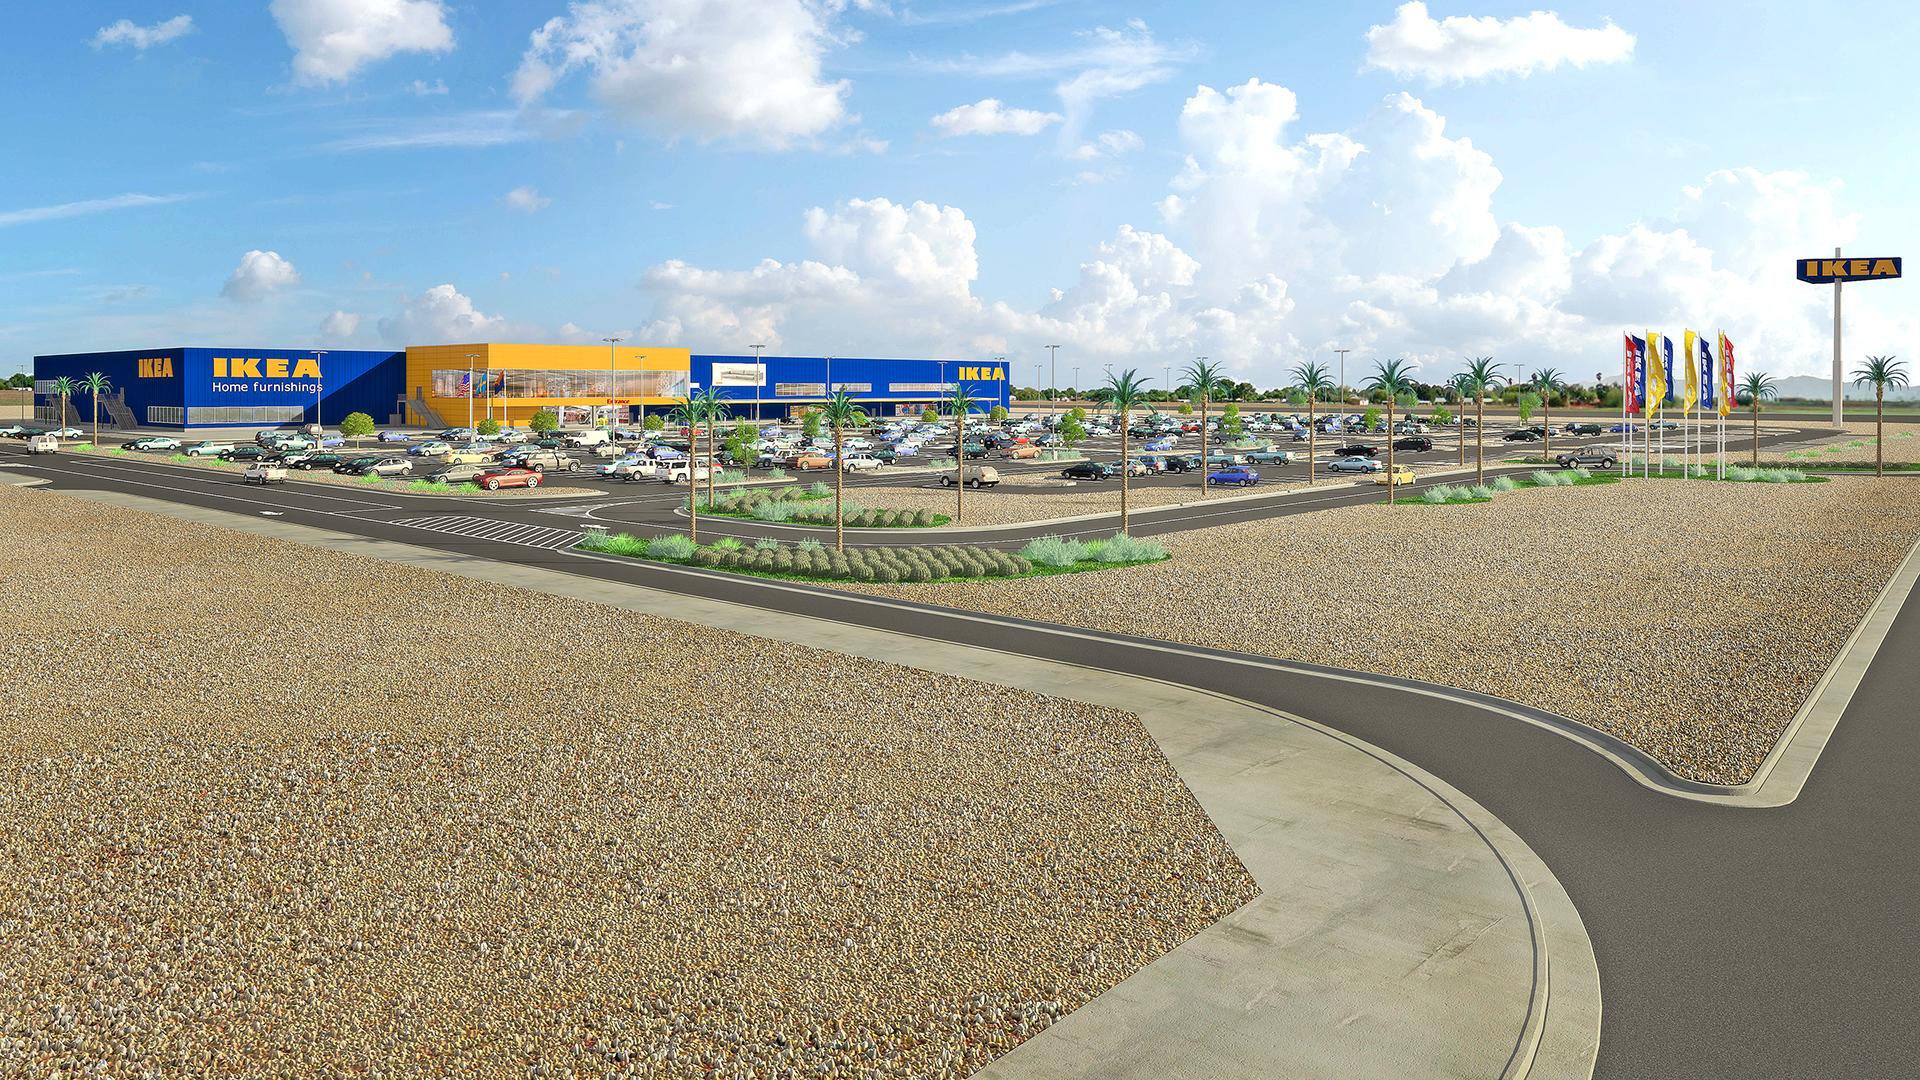 Ikea plans to open second phoenix area location in glendale for Ikea scottsdale arizona